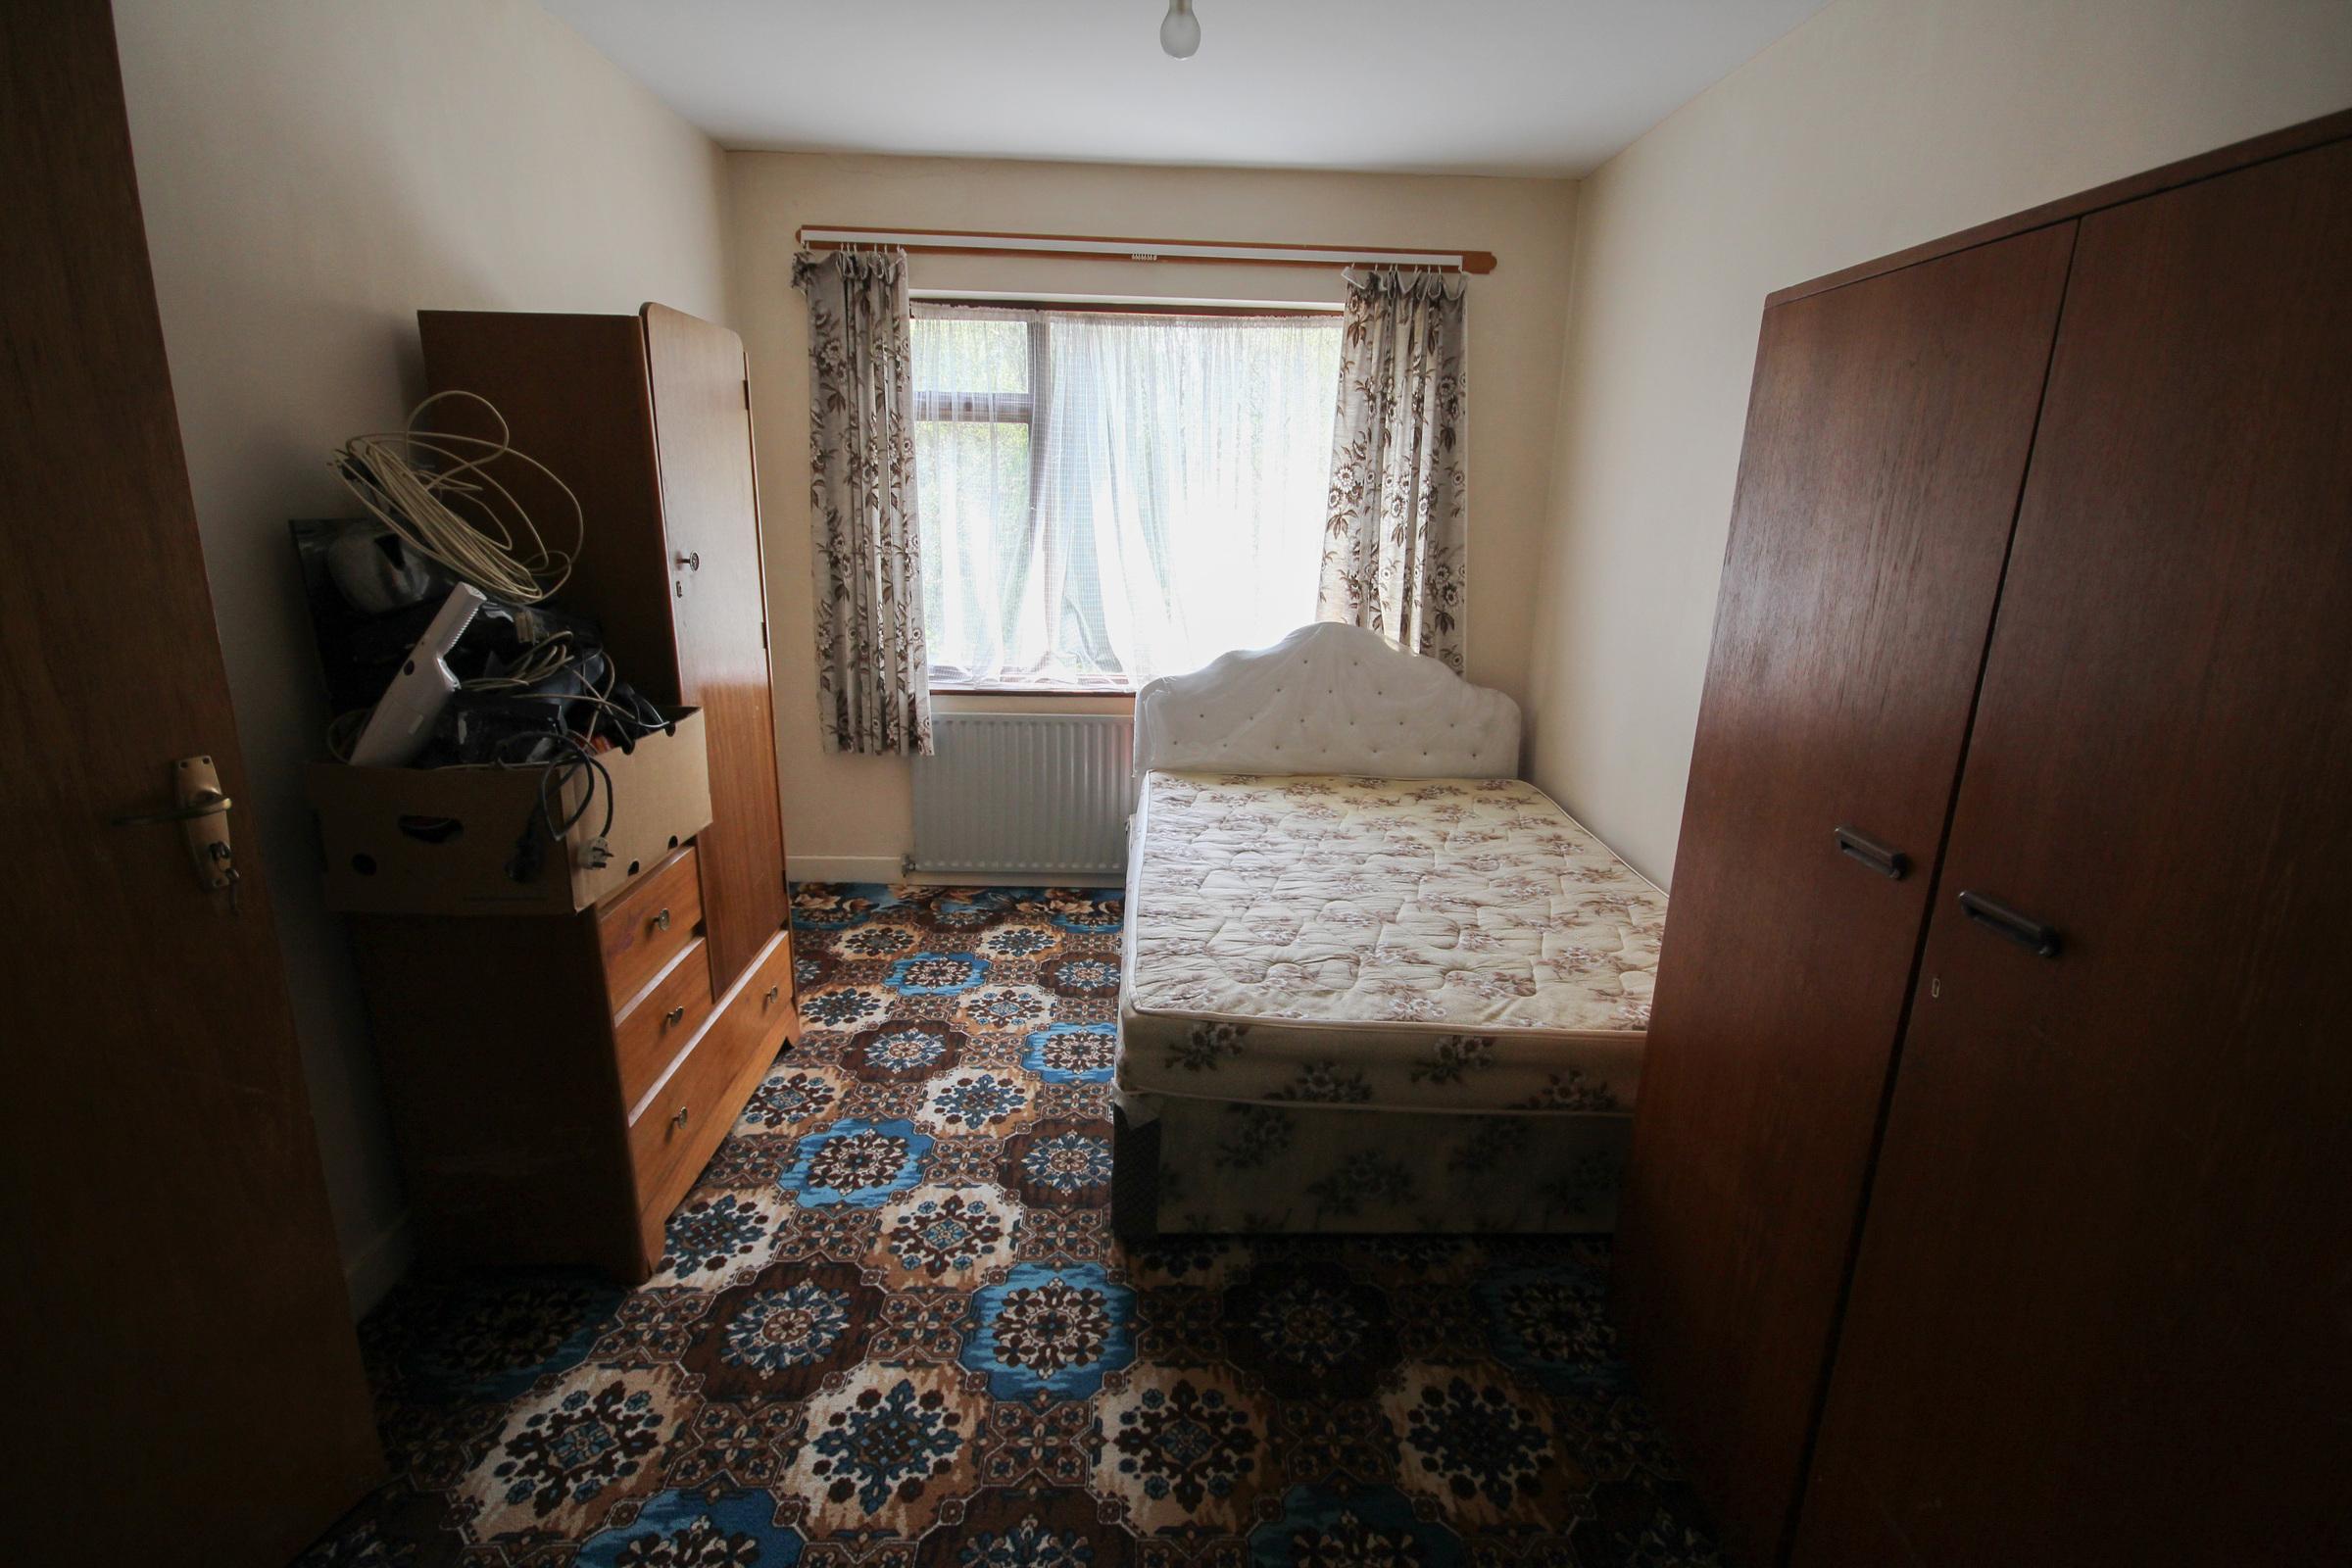 Manor Kilbride, Co. Wicklow